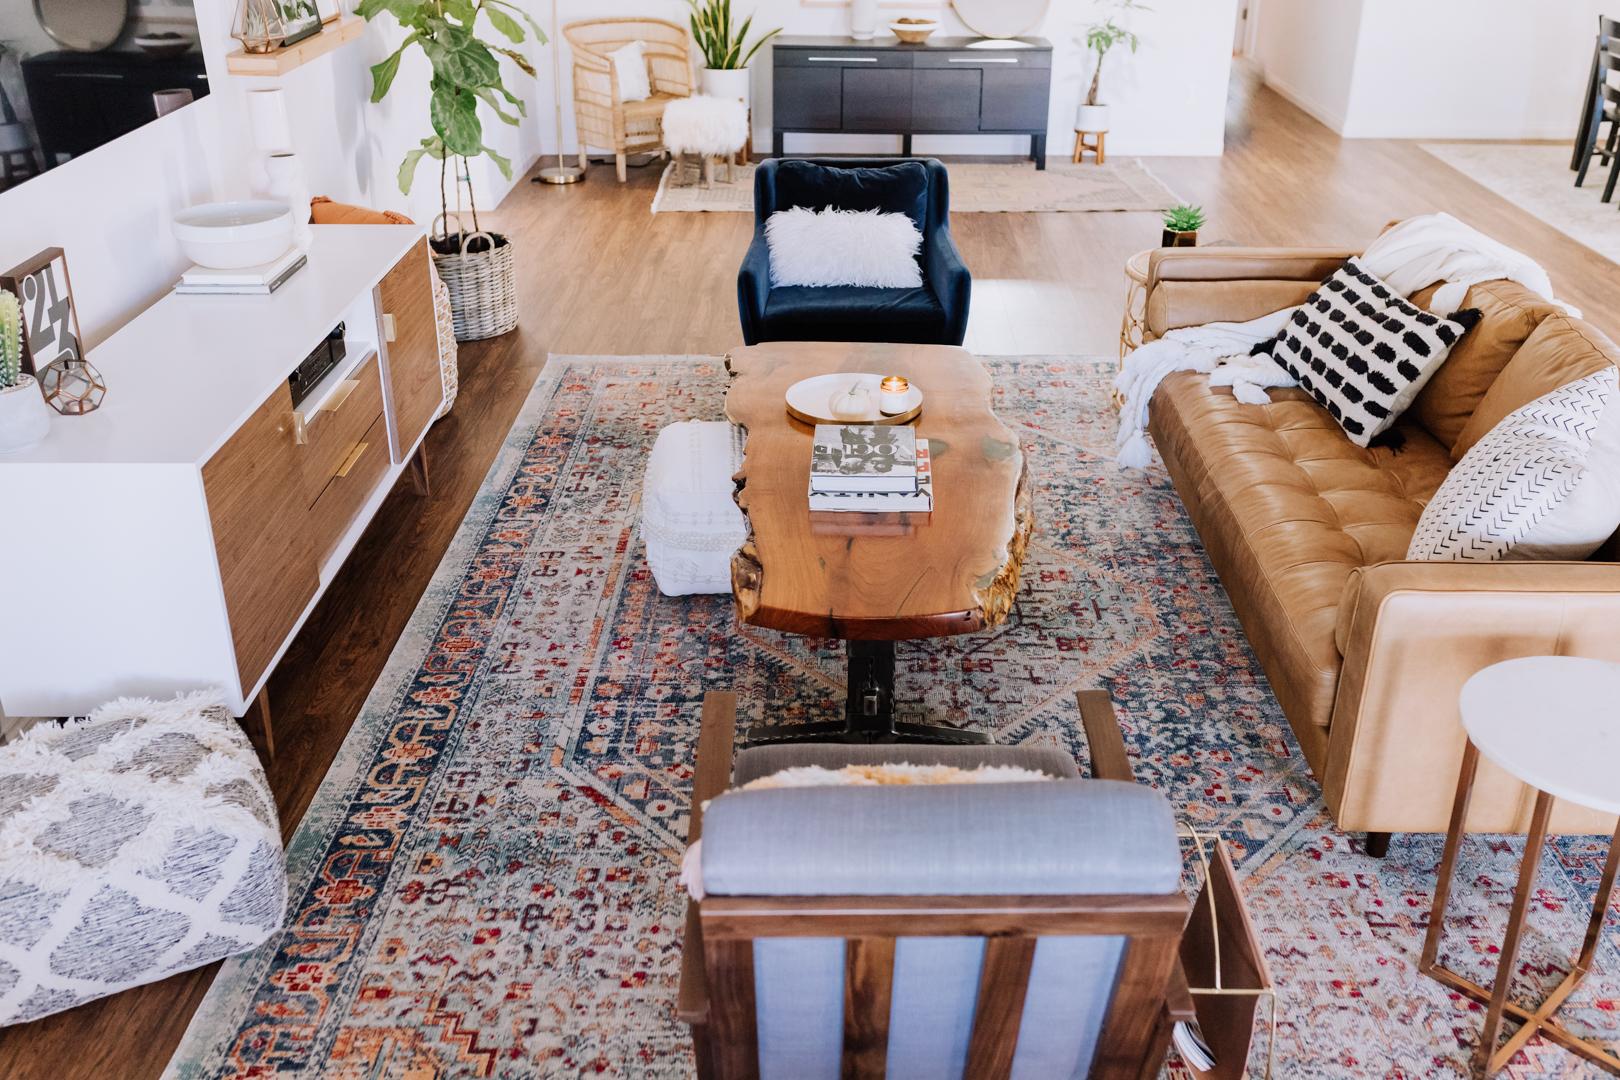 the ldl home living room reveal | thelovedesignedlife.com #theldlhome #livingroom #interiordesign